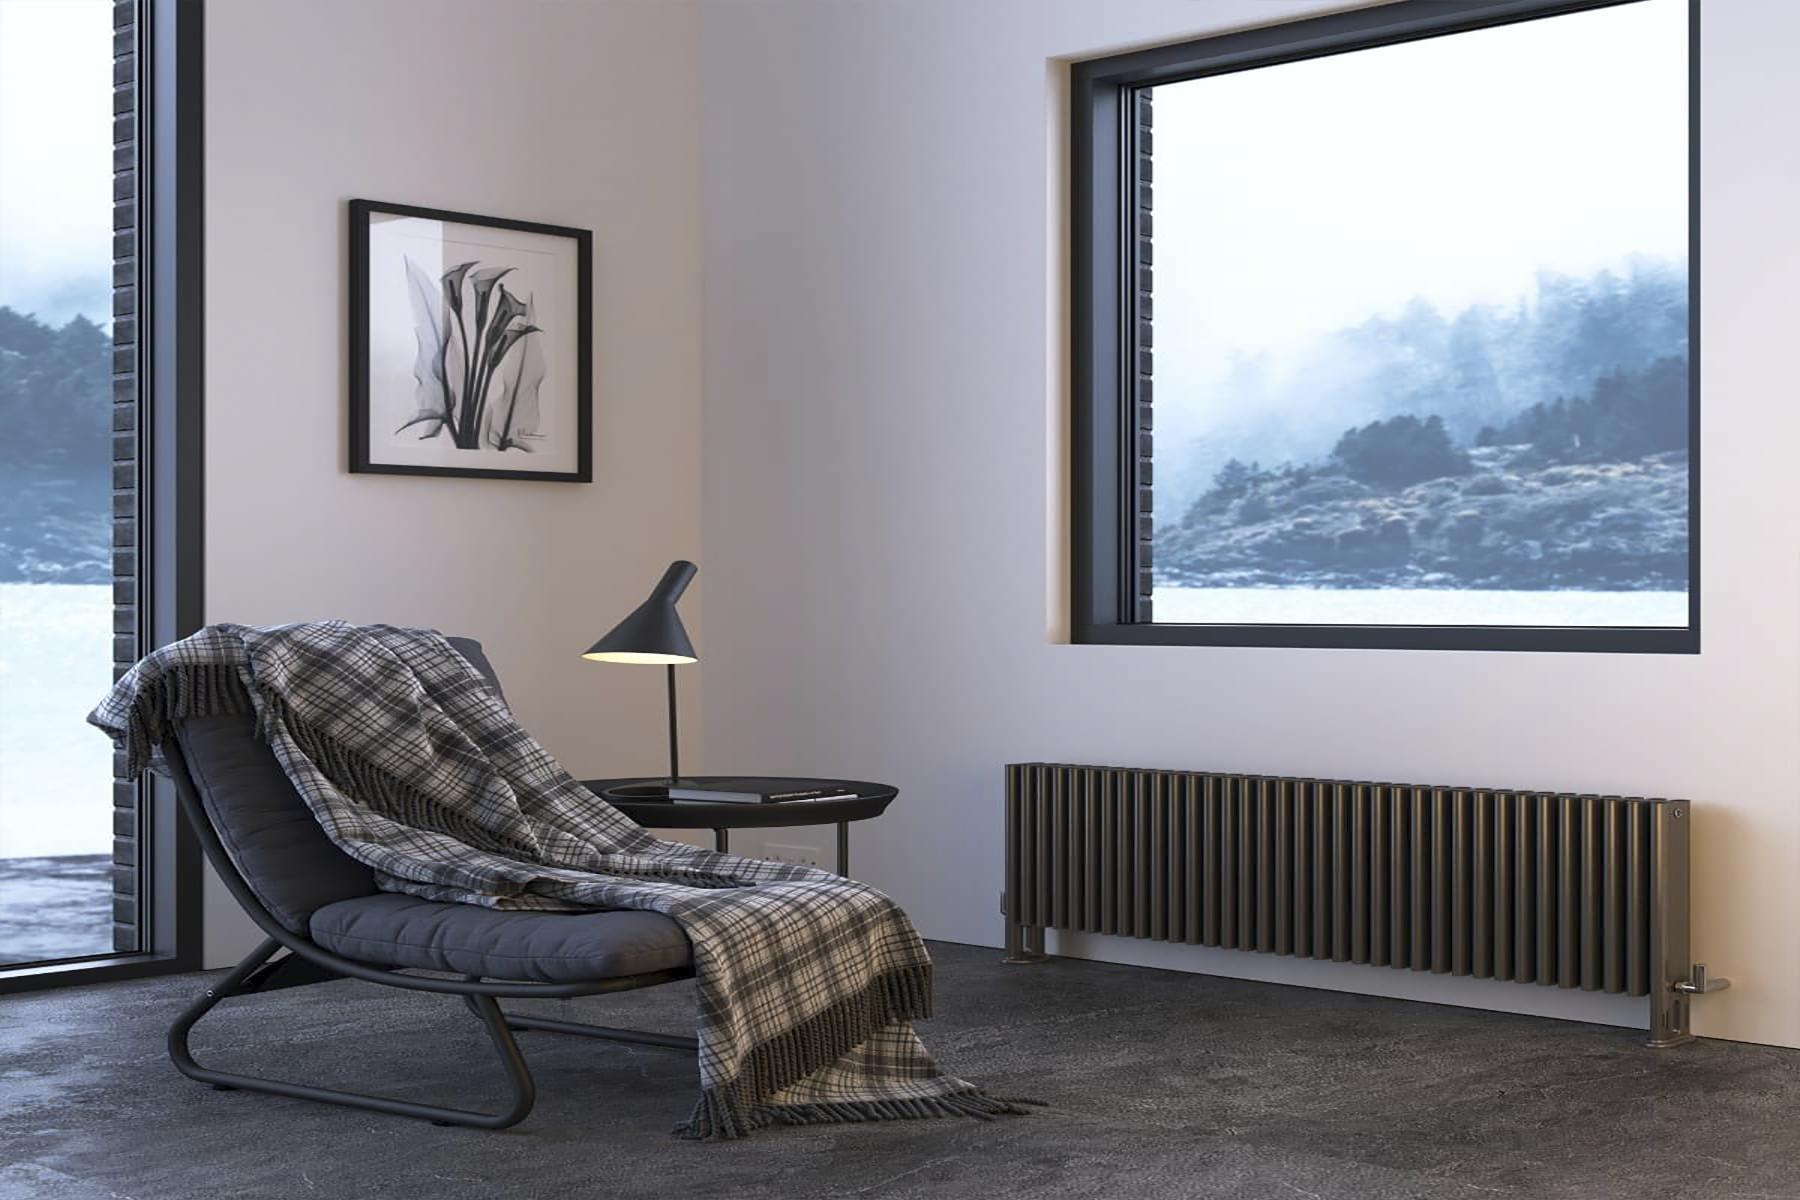 Benefits of aluminium radiators